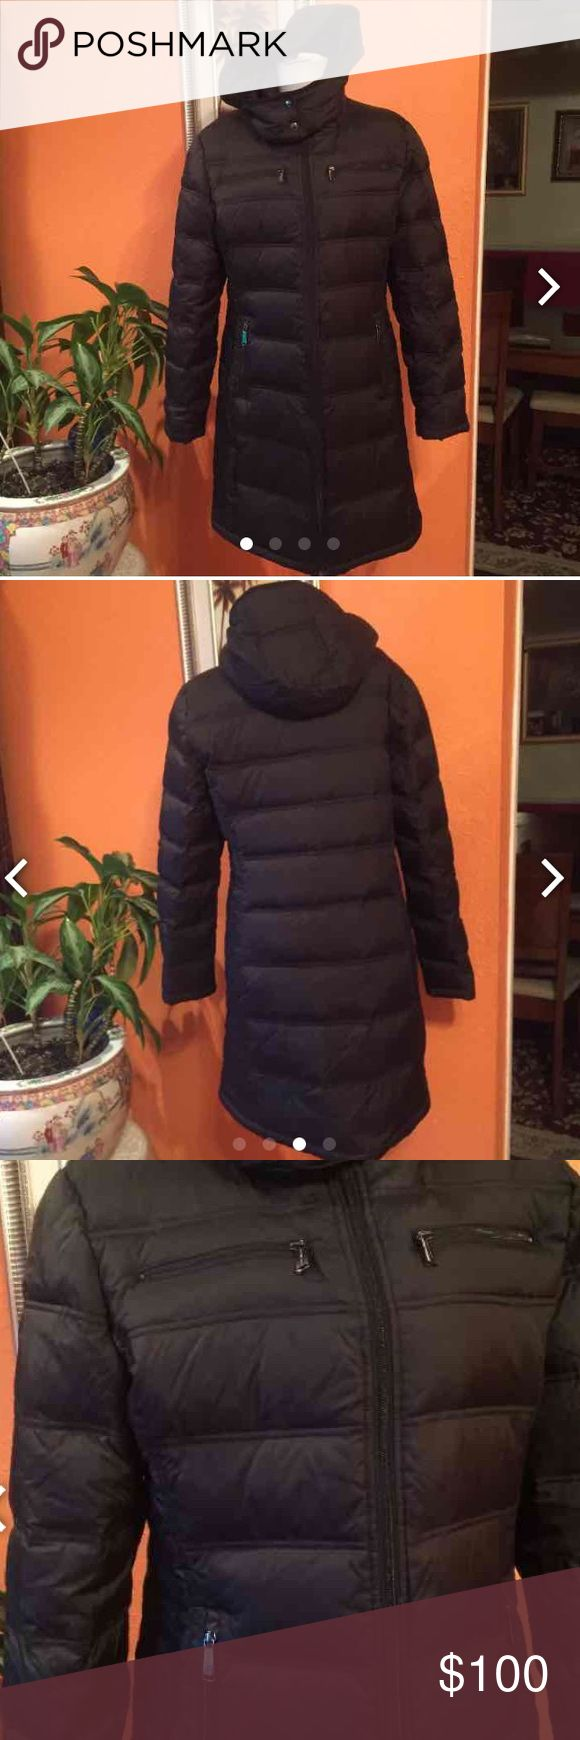 Michael Kors puffer coat Nice warm long like new coat Michael Kors Jackets & Coats Puffers